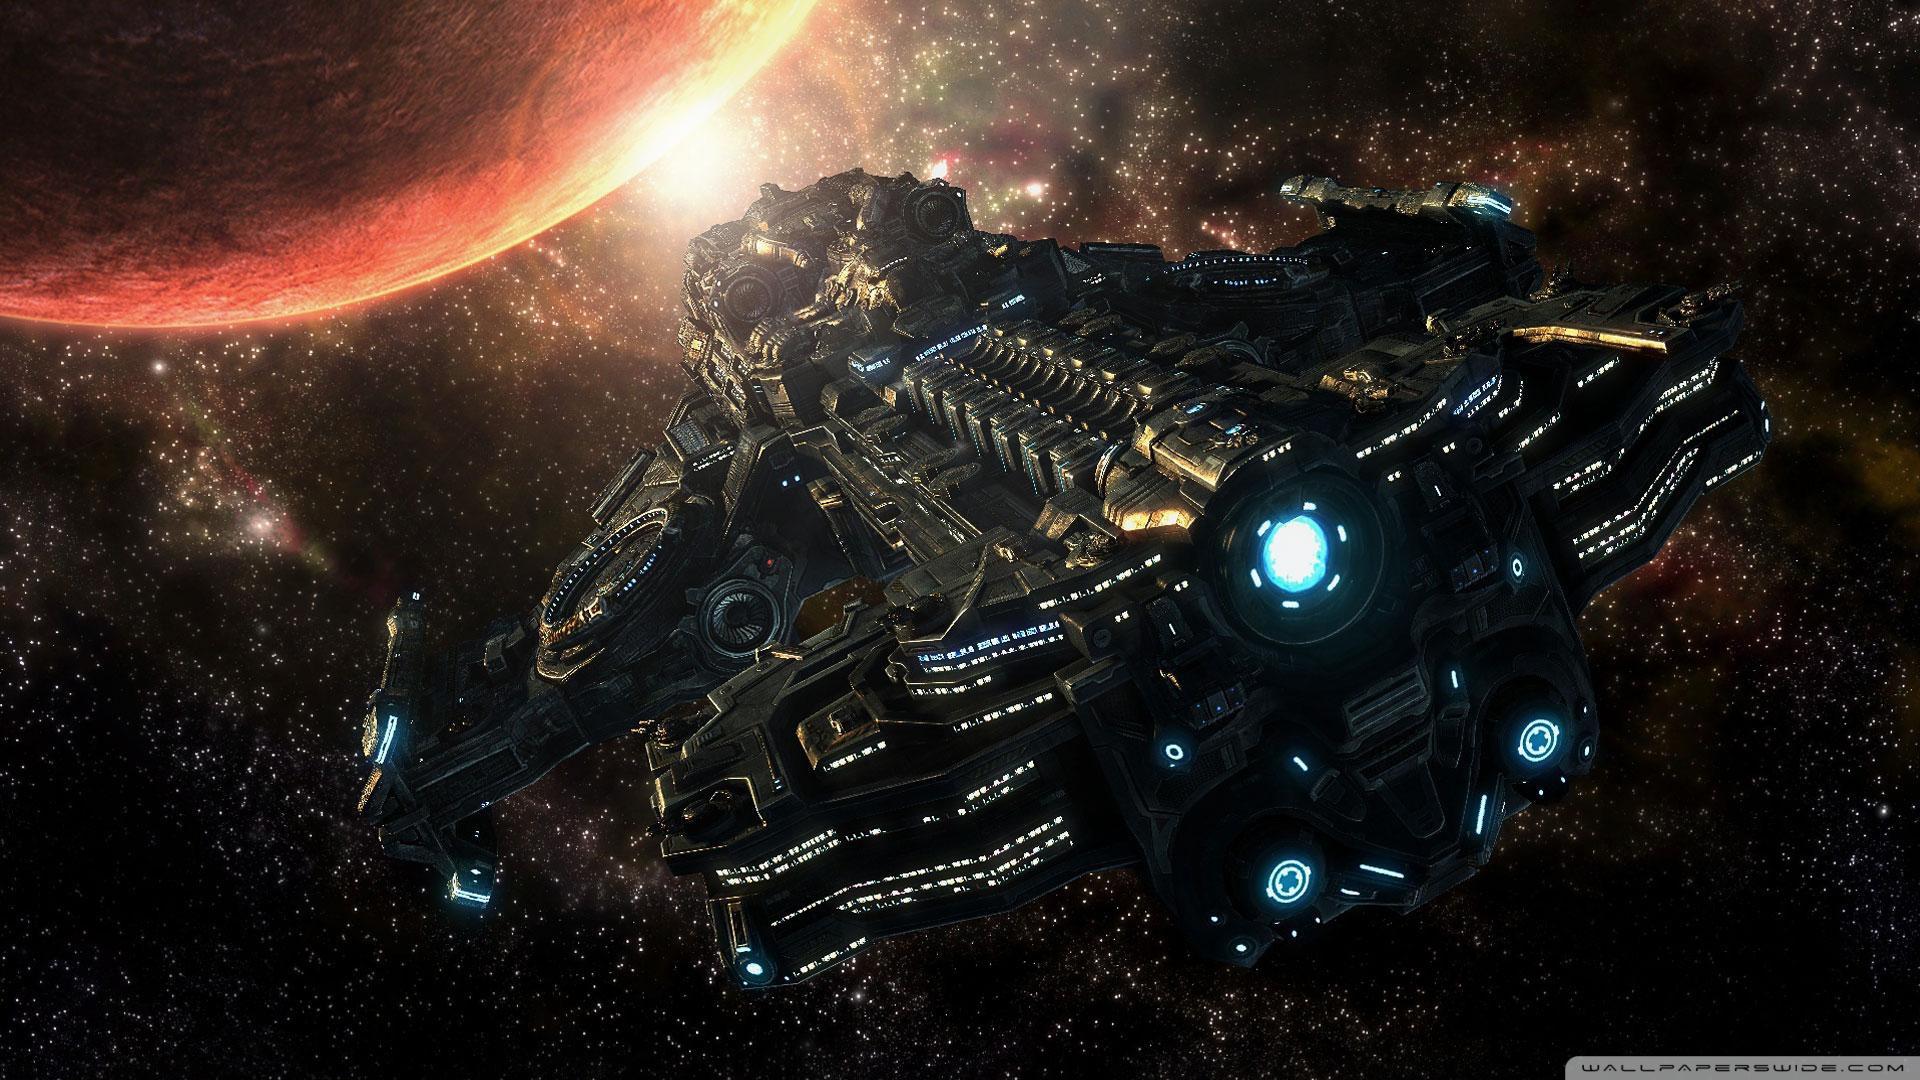 starcraft-1920x1080-Google-Search-wallpaper-wp36010864